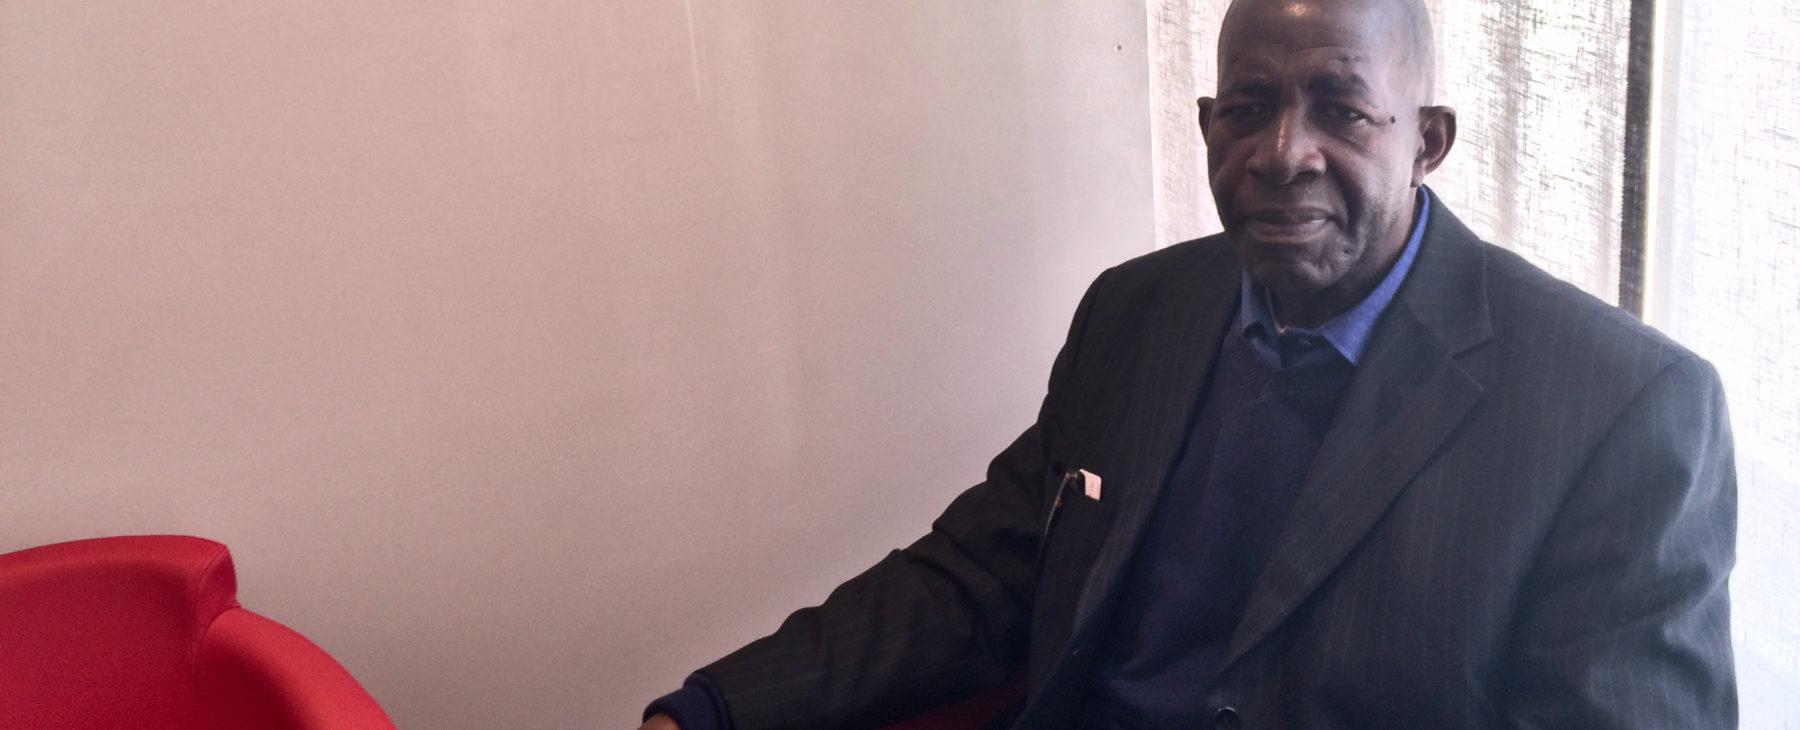 Pierre-Claver Mbonimpa : «Seul le dialogue mettra fin à la crise au Burundi»